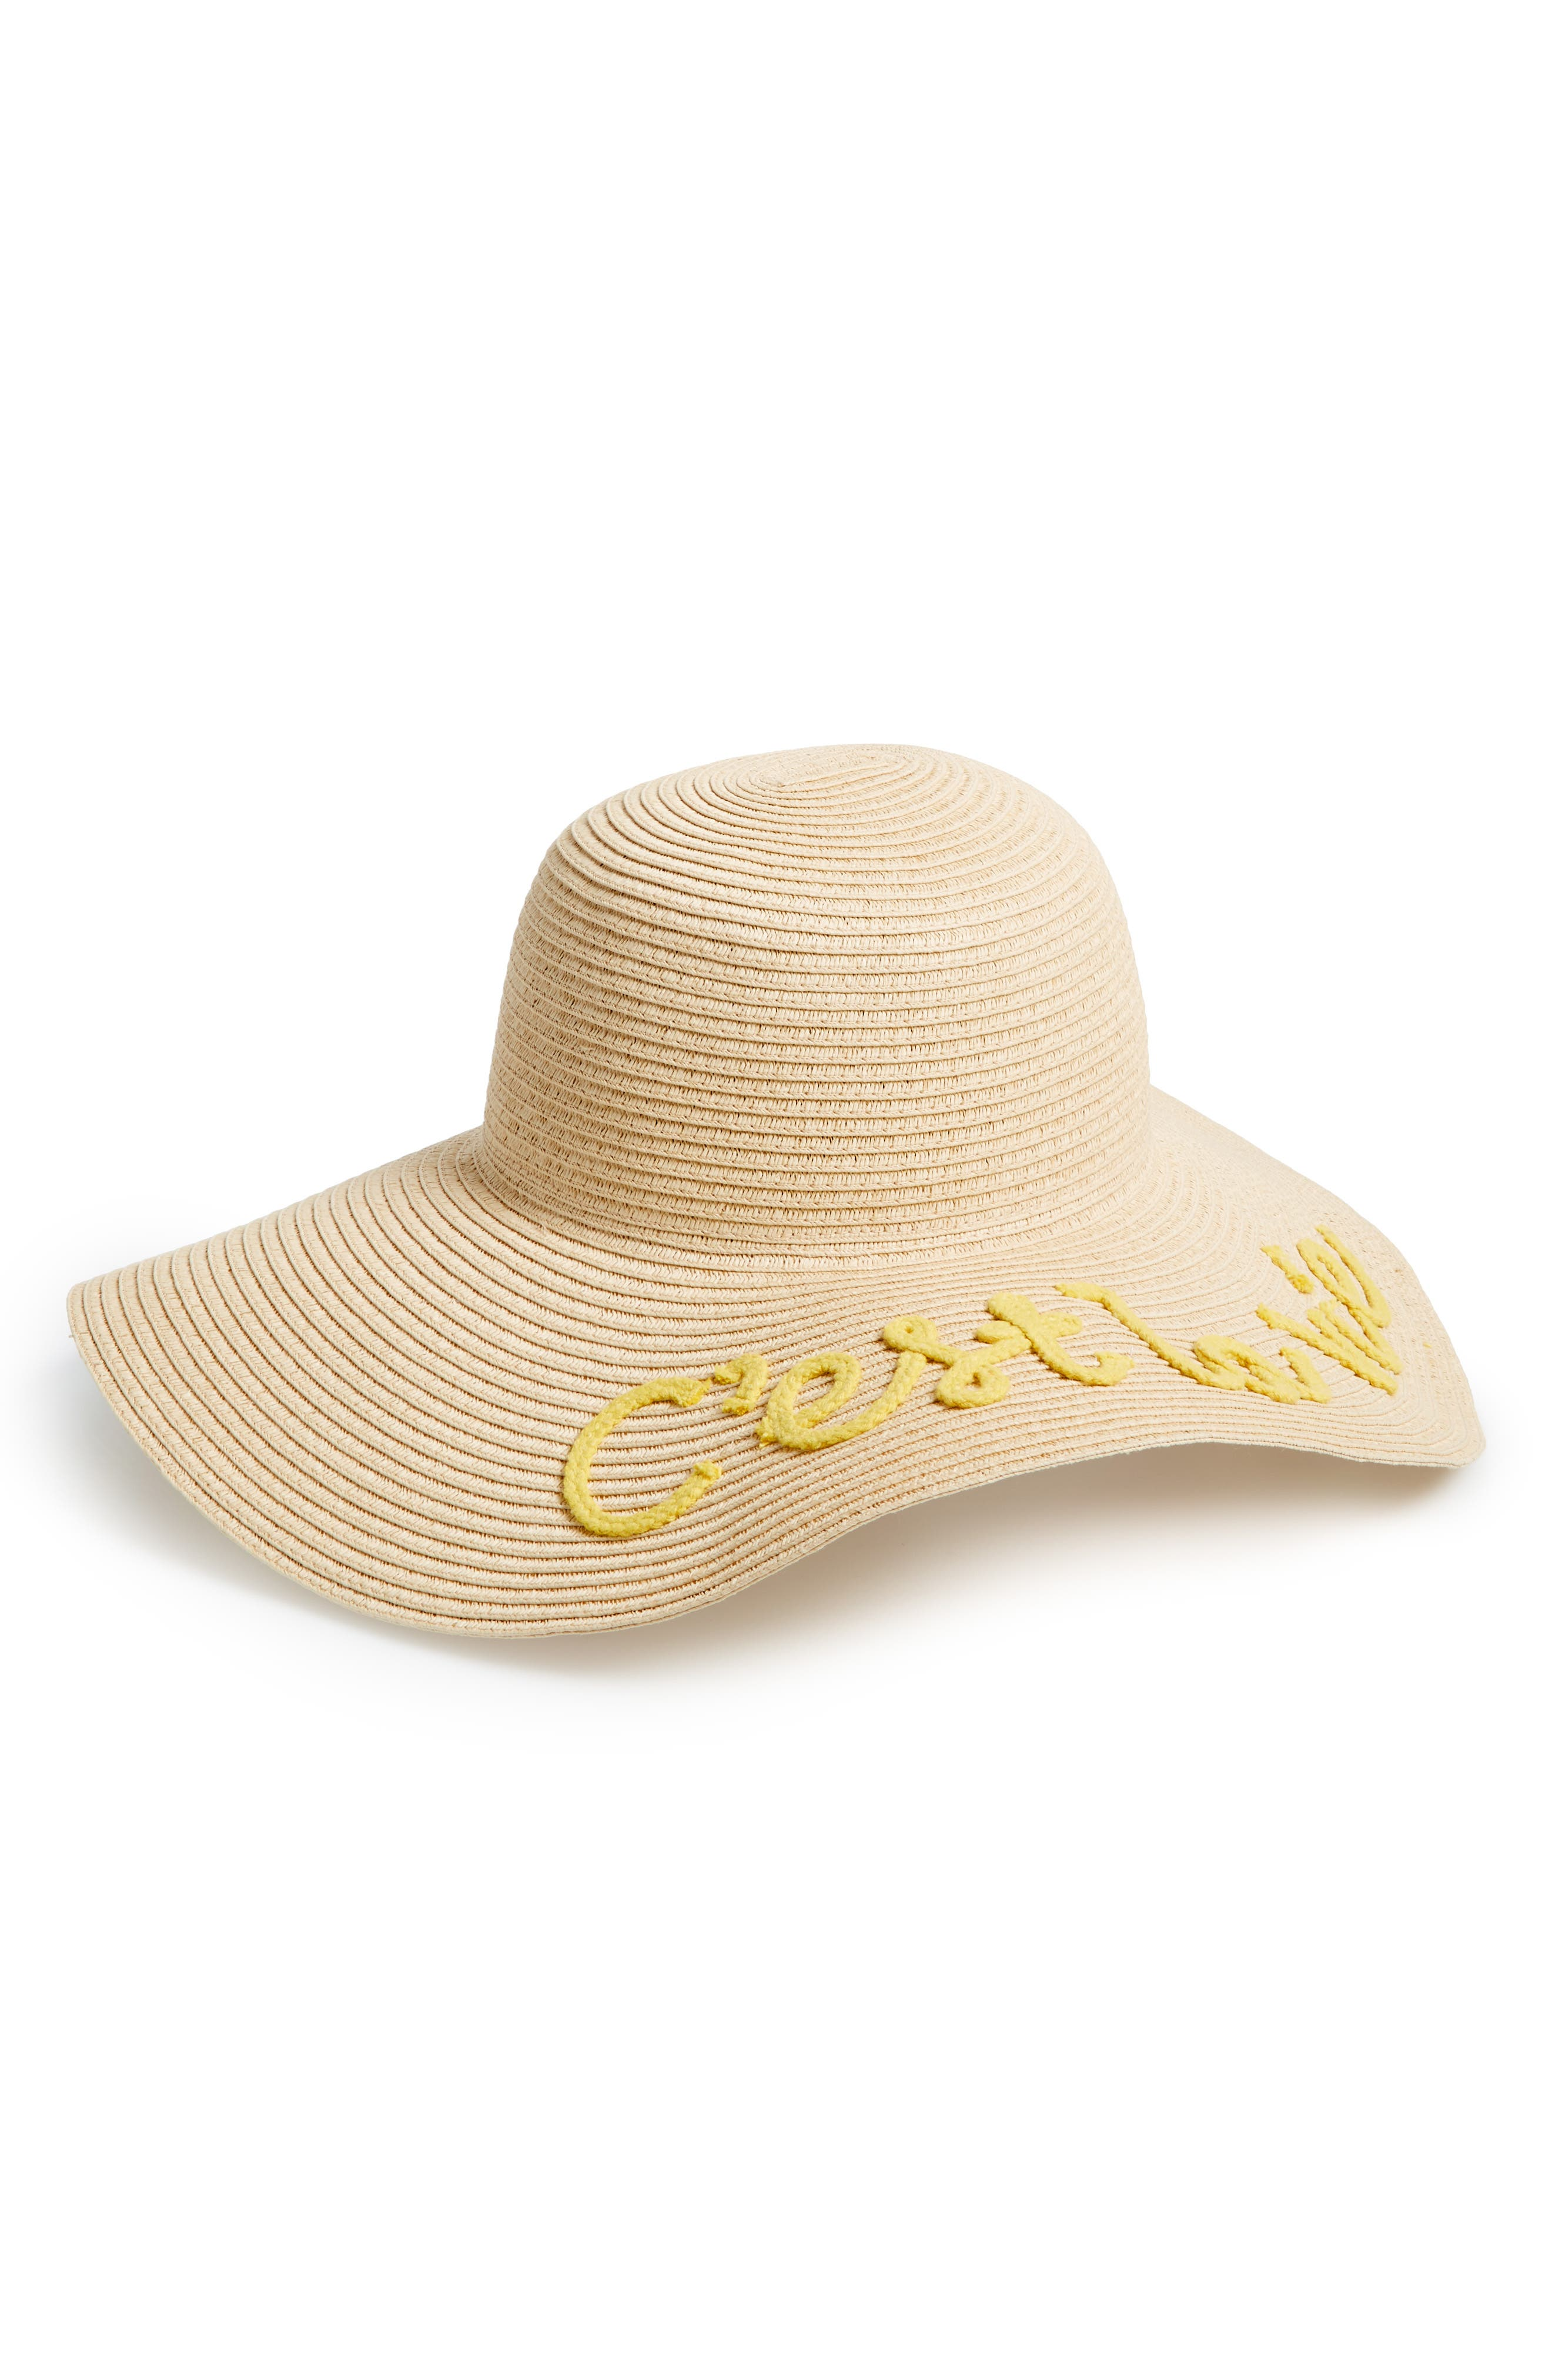 Alternate Image 1 Selected - BP. C'est La Vie Floppy Straw Hat